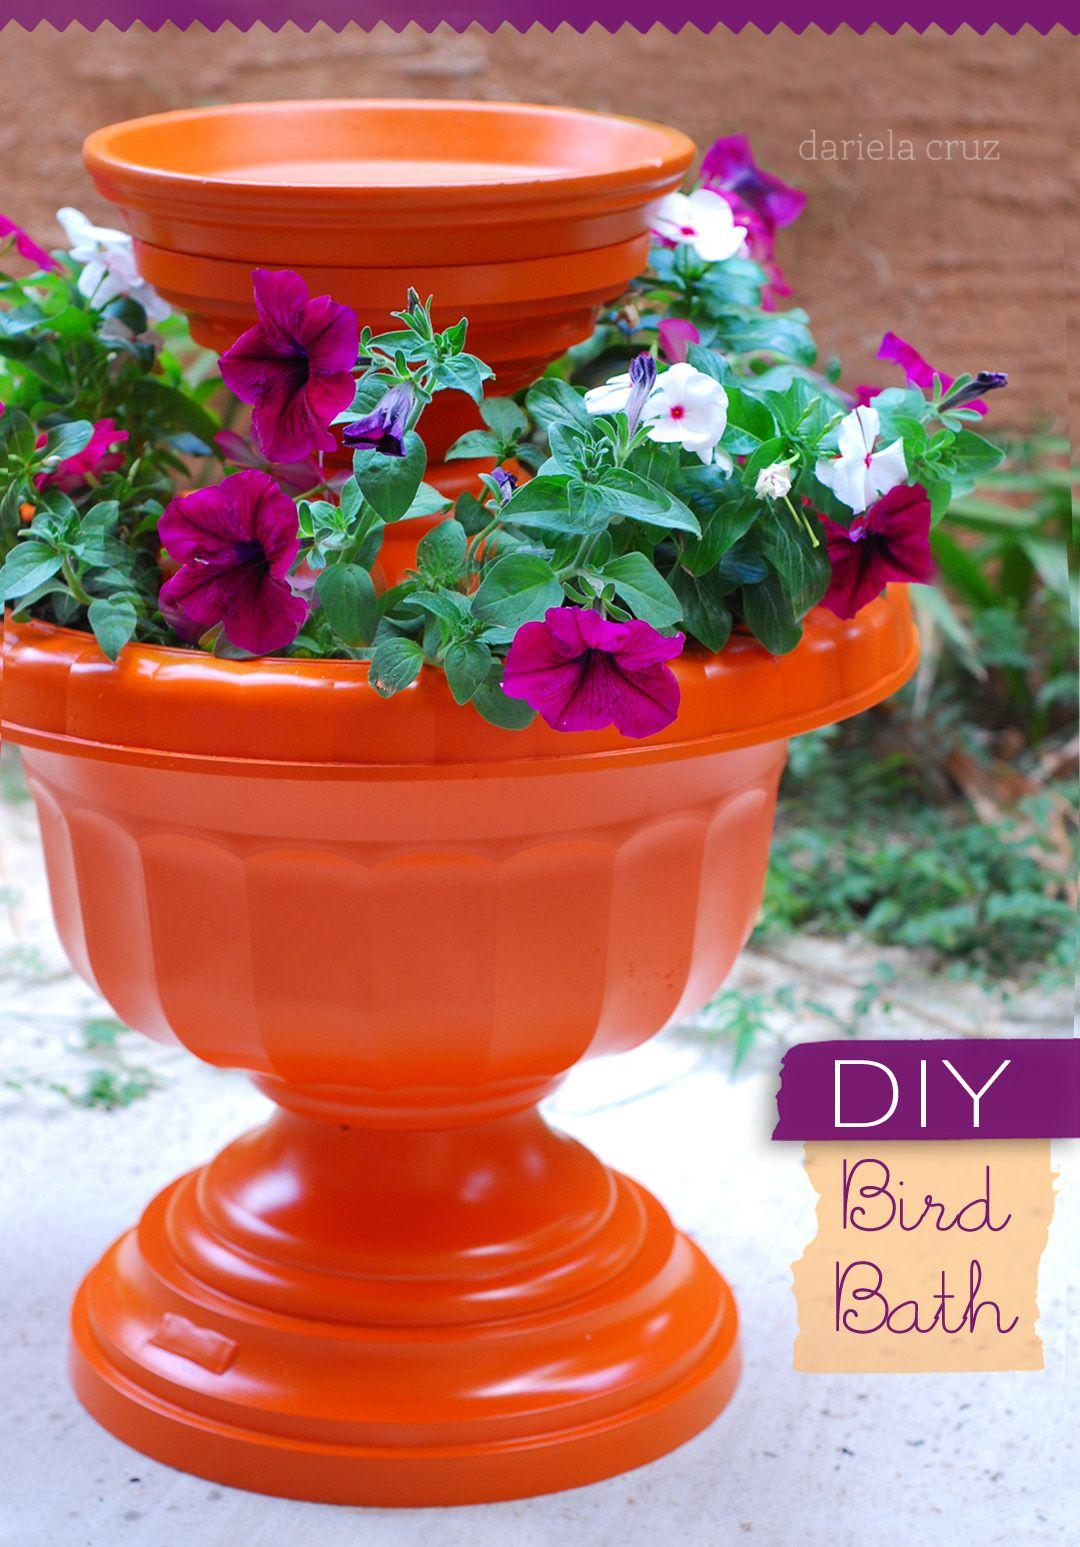 How to make a birdbath - 25 Diy Garden Projects Anyone Can Make